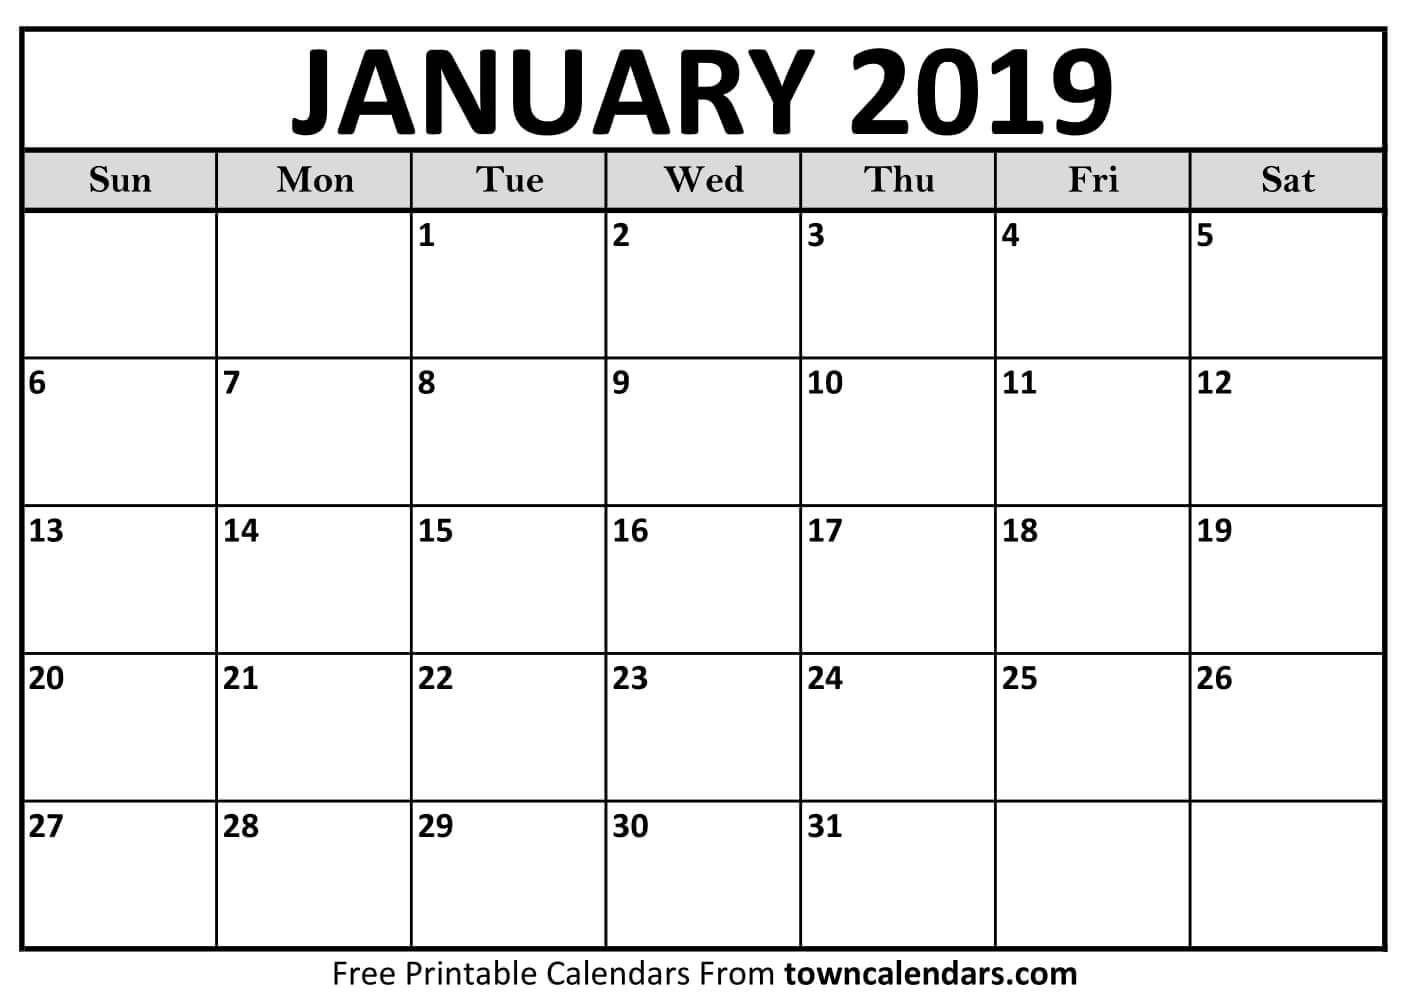 Printable January 2019 Calendar | Free January 2019 Calendar Calendar 2019 Google